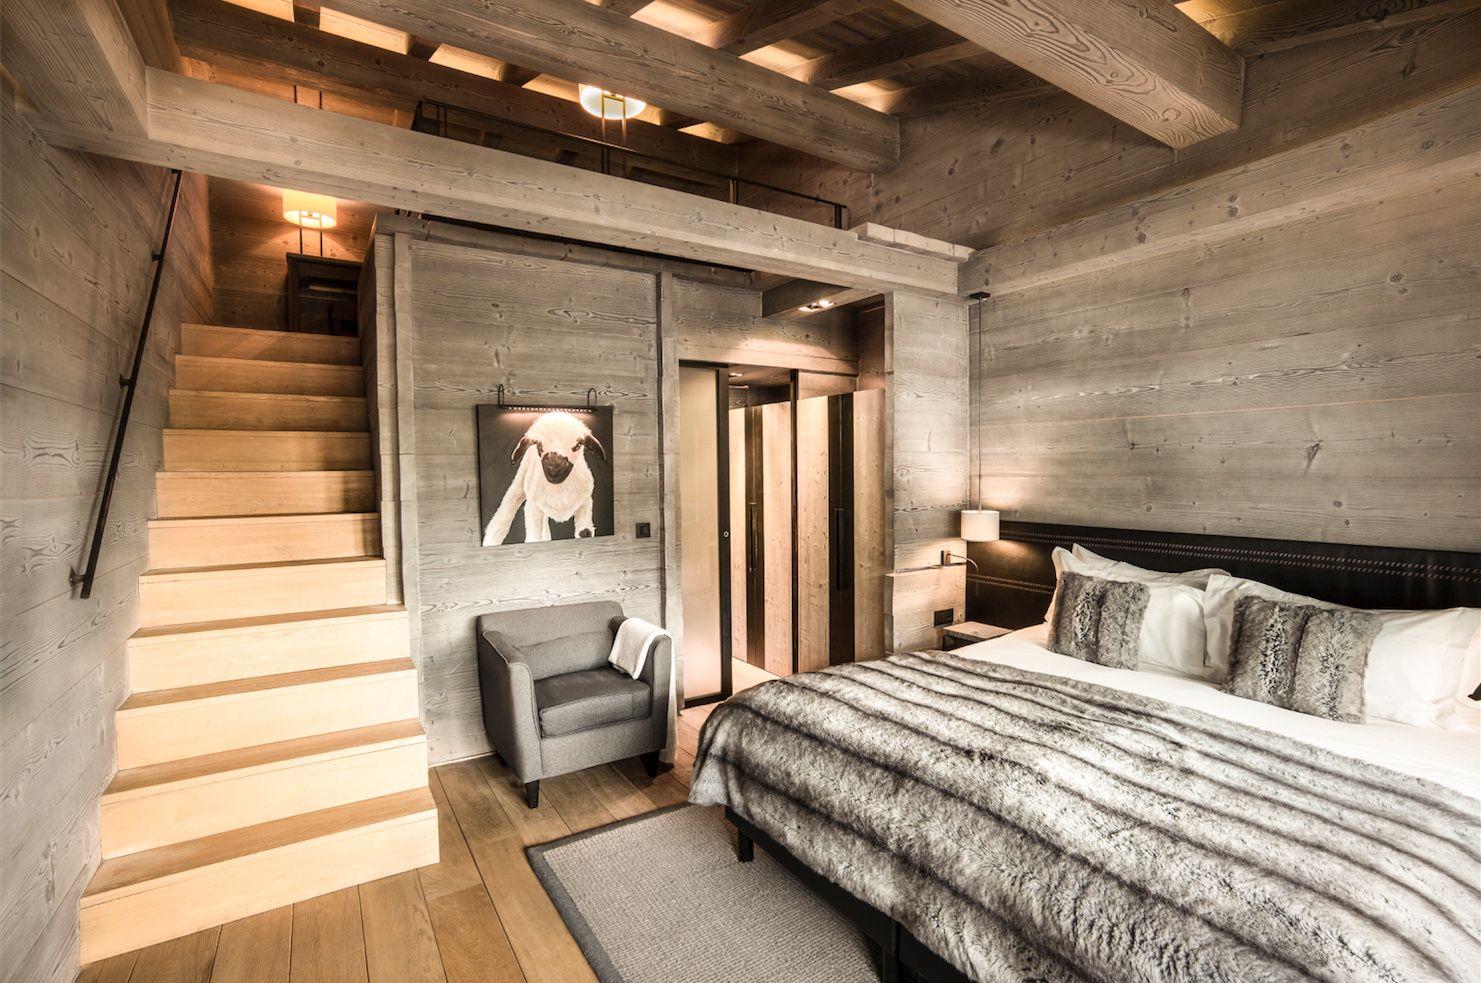 Hotel Alpaga, Megeve, France | Hotels STYLE | Pinterest | Hotel room ...